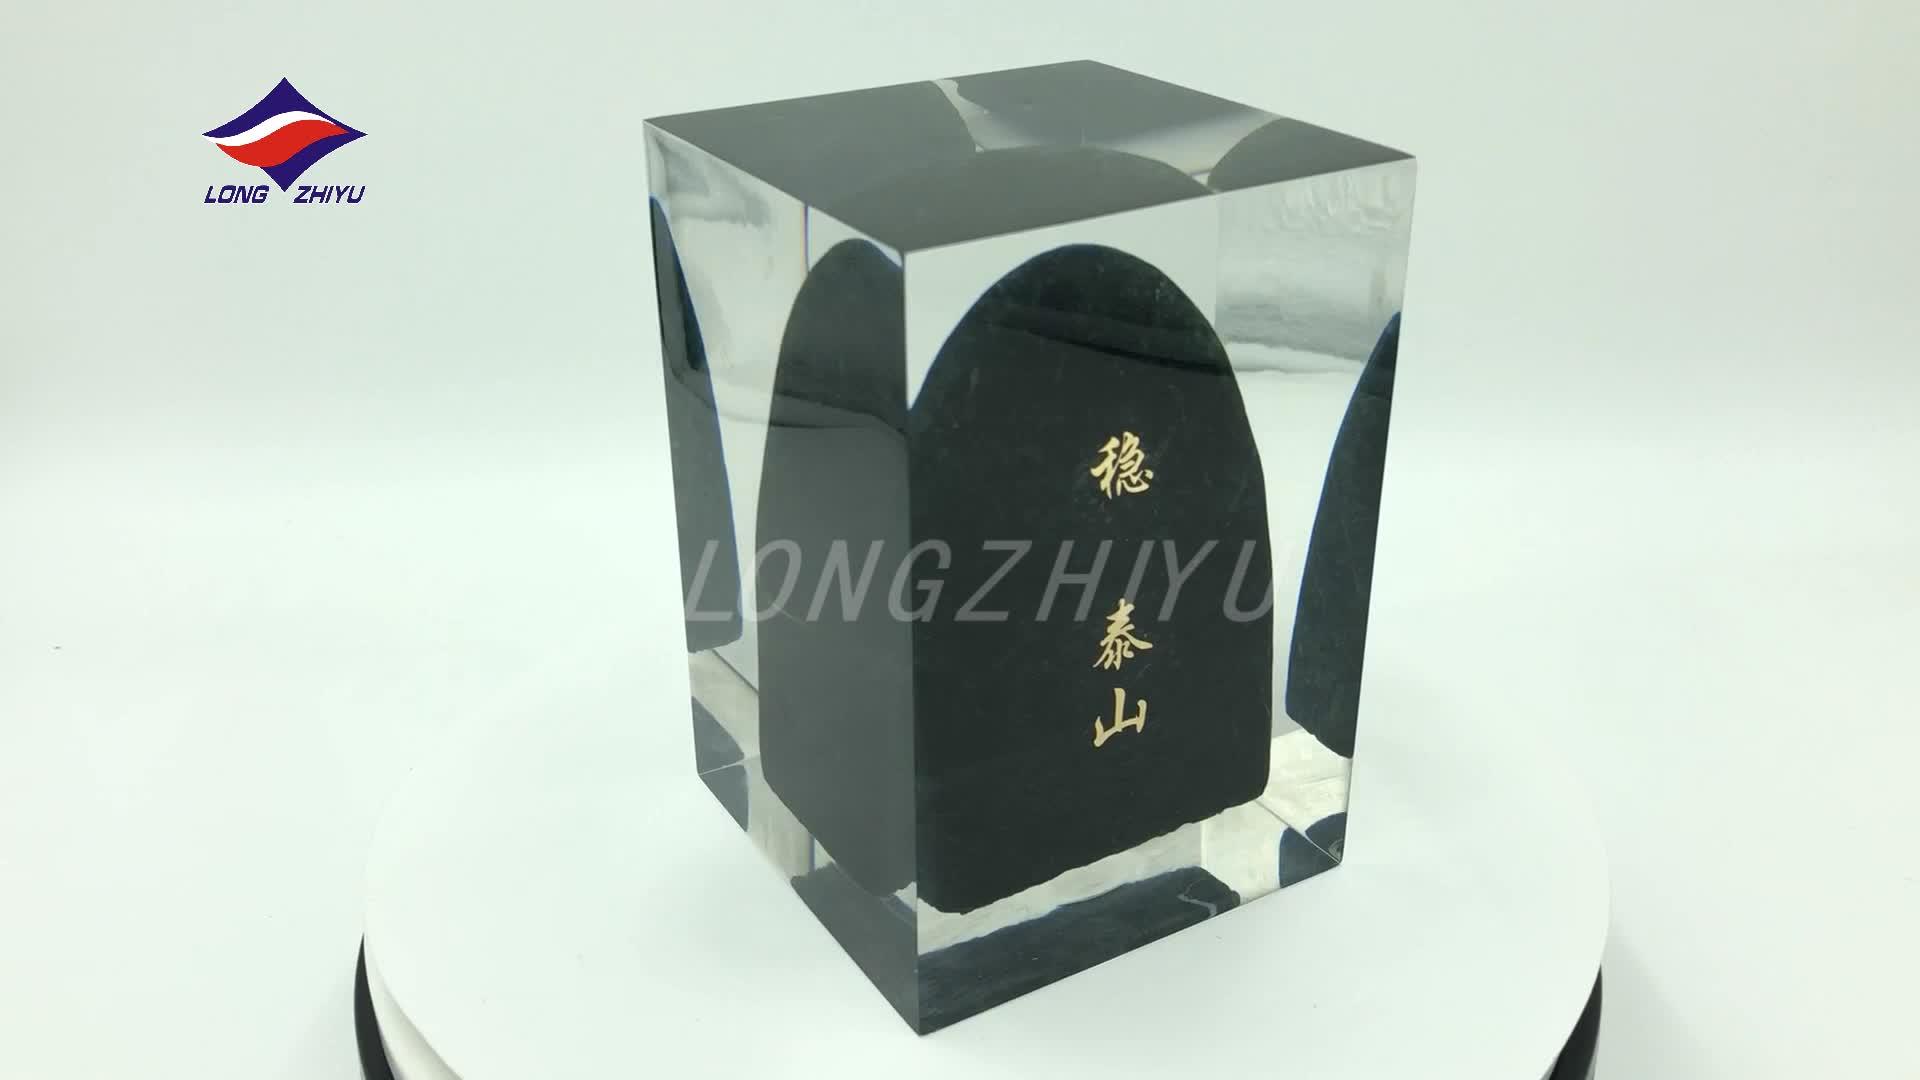 Longzhiyu 14 שנים סין מקצועי ברור אקריליק מלאכות ספק מותאם אישית אקריליק מזכרות שלט מותאם אישית אמנות קישוט